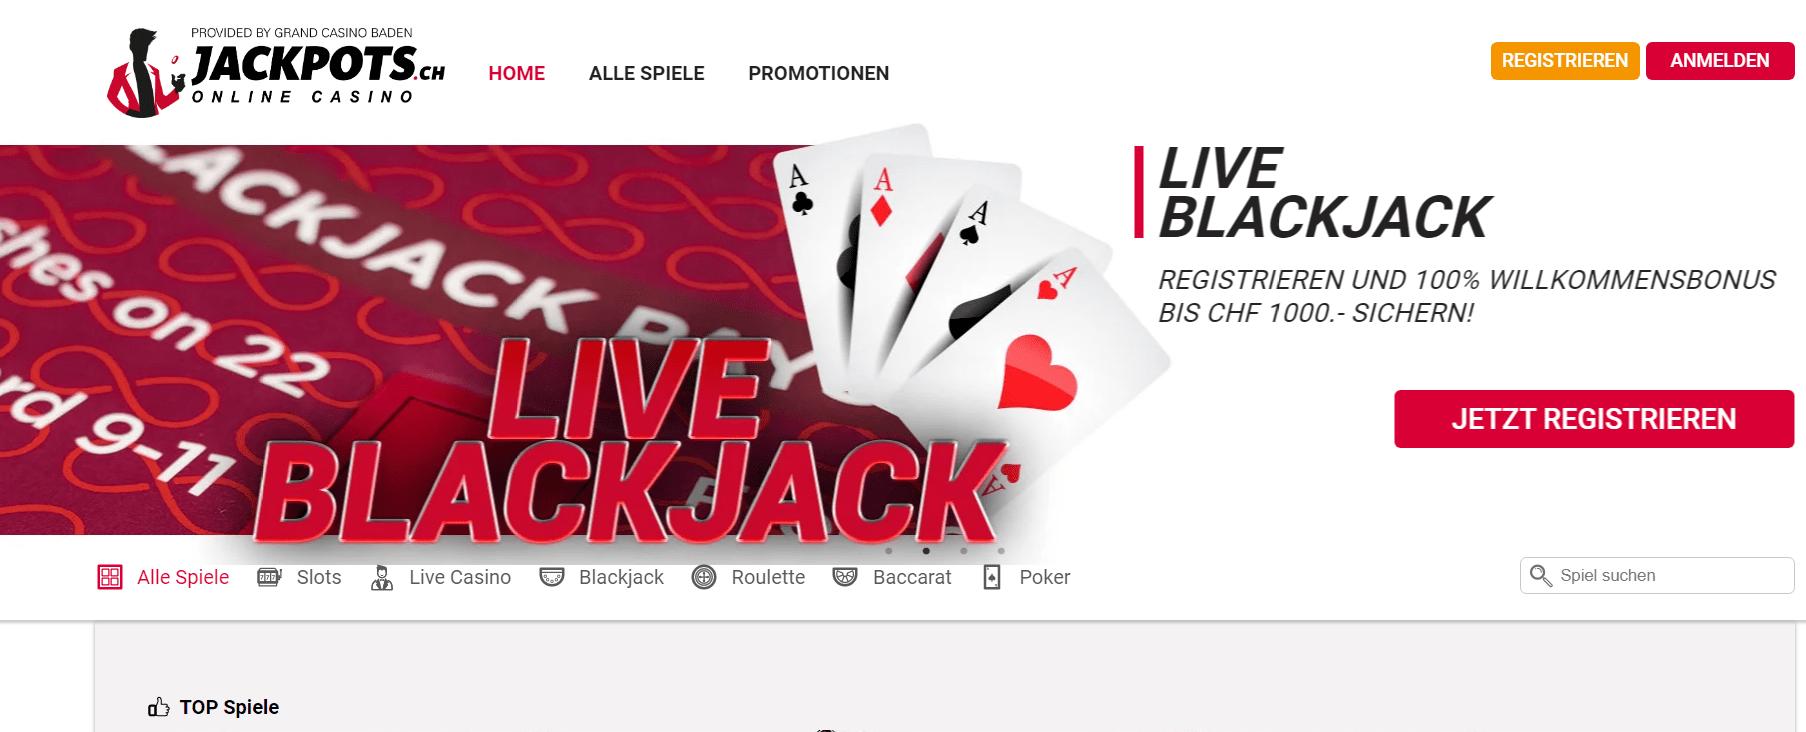 Jackpots ch live casino